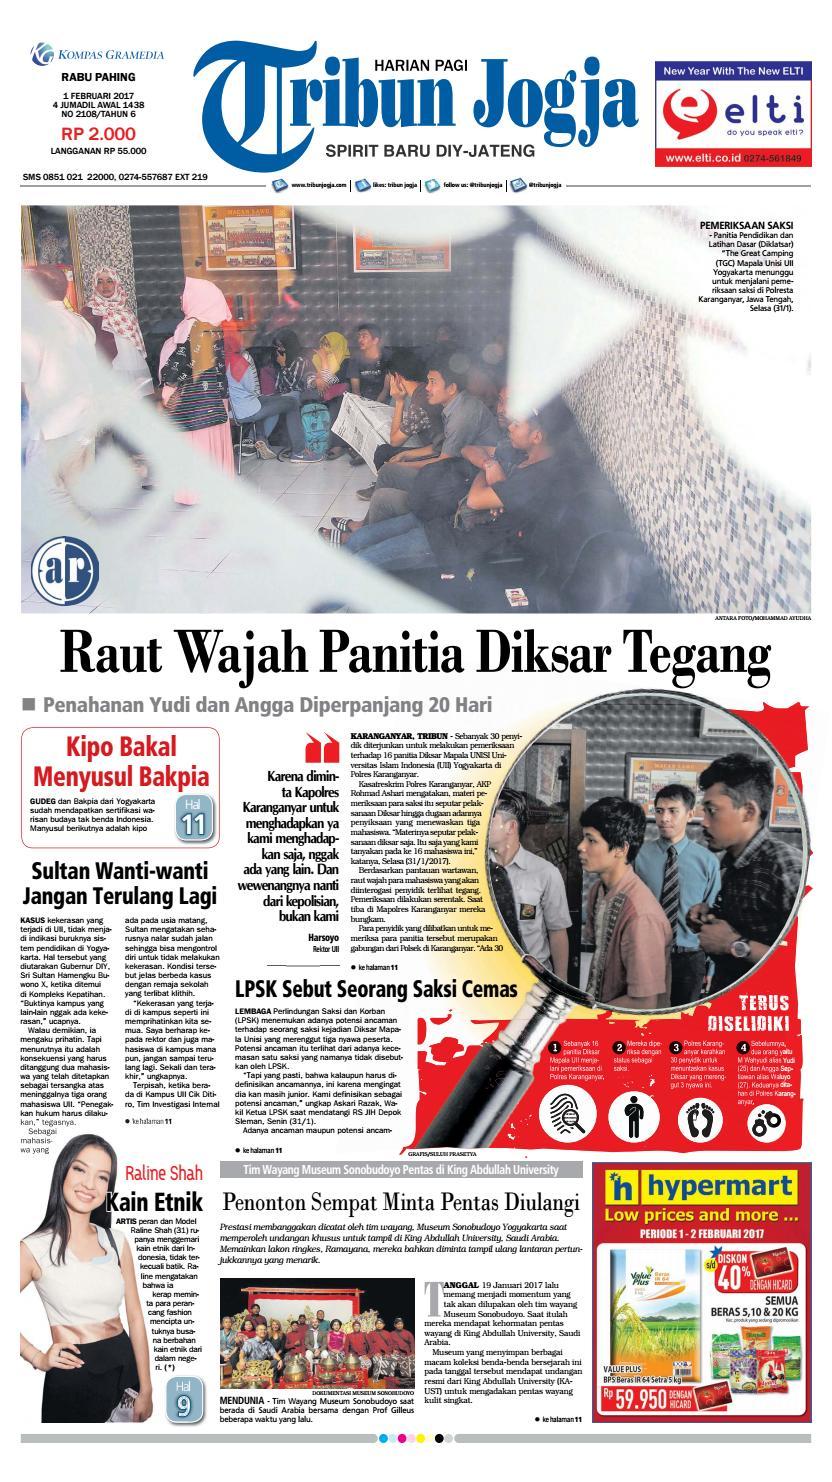 Tribunjogja 01 02 2017 By Tribun Jogja Issuu Produk Ukm Bumn Baju Muslim Anak Laki Dannis Nomor 10 Abu